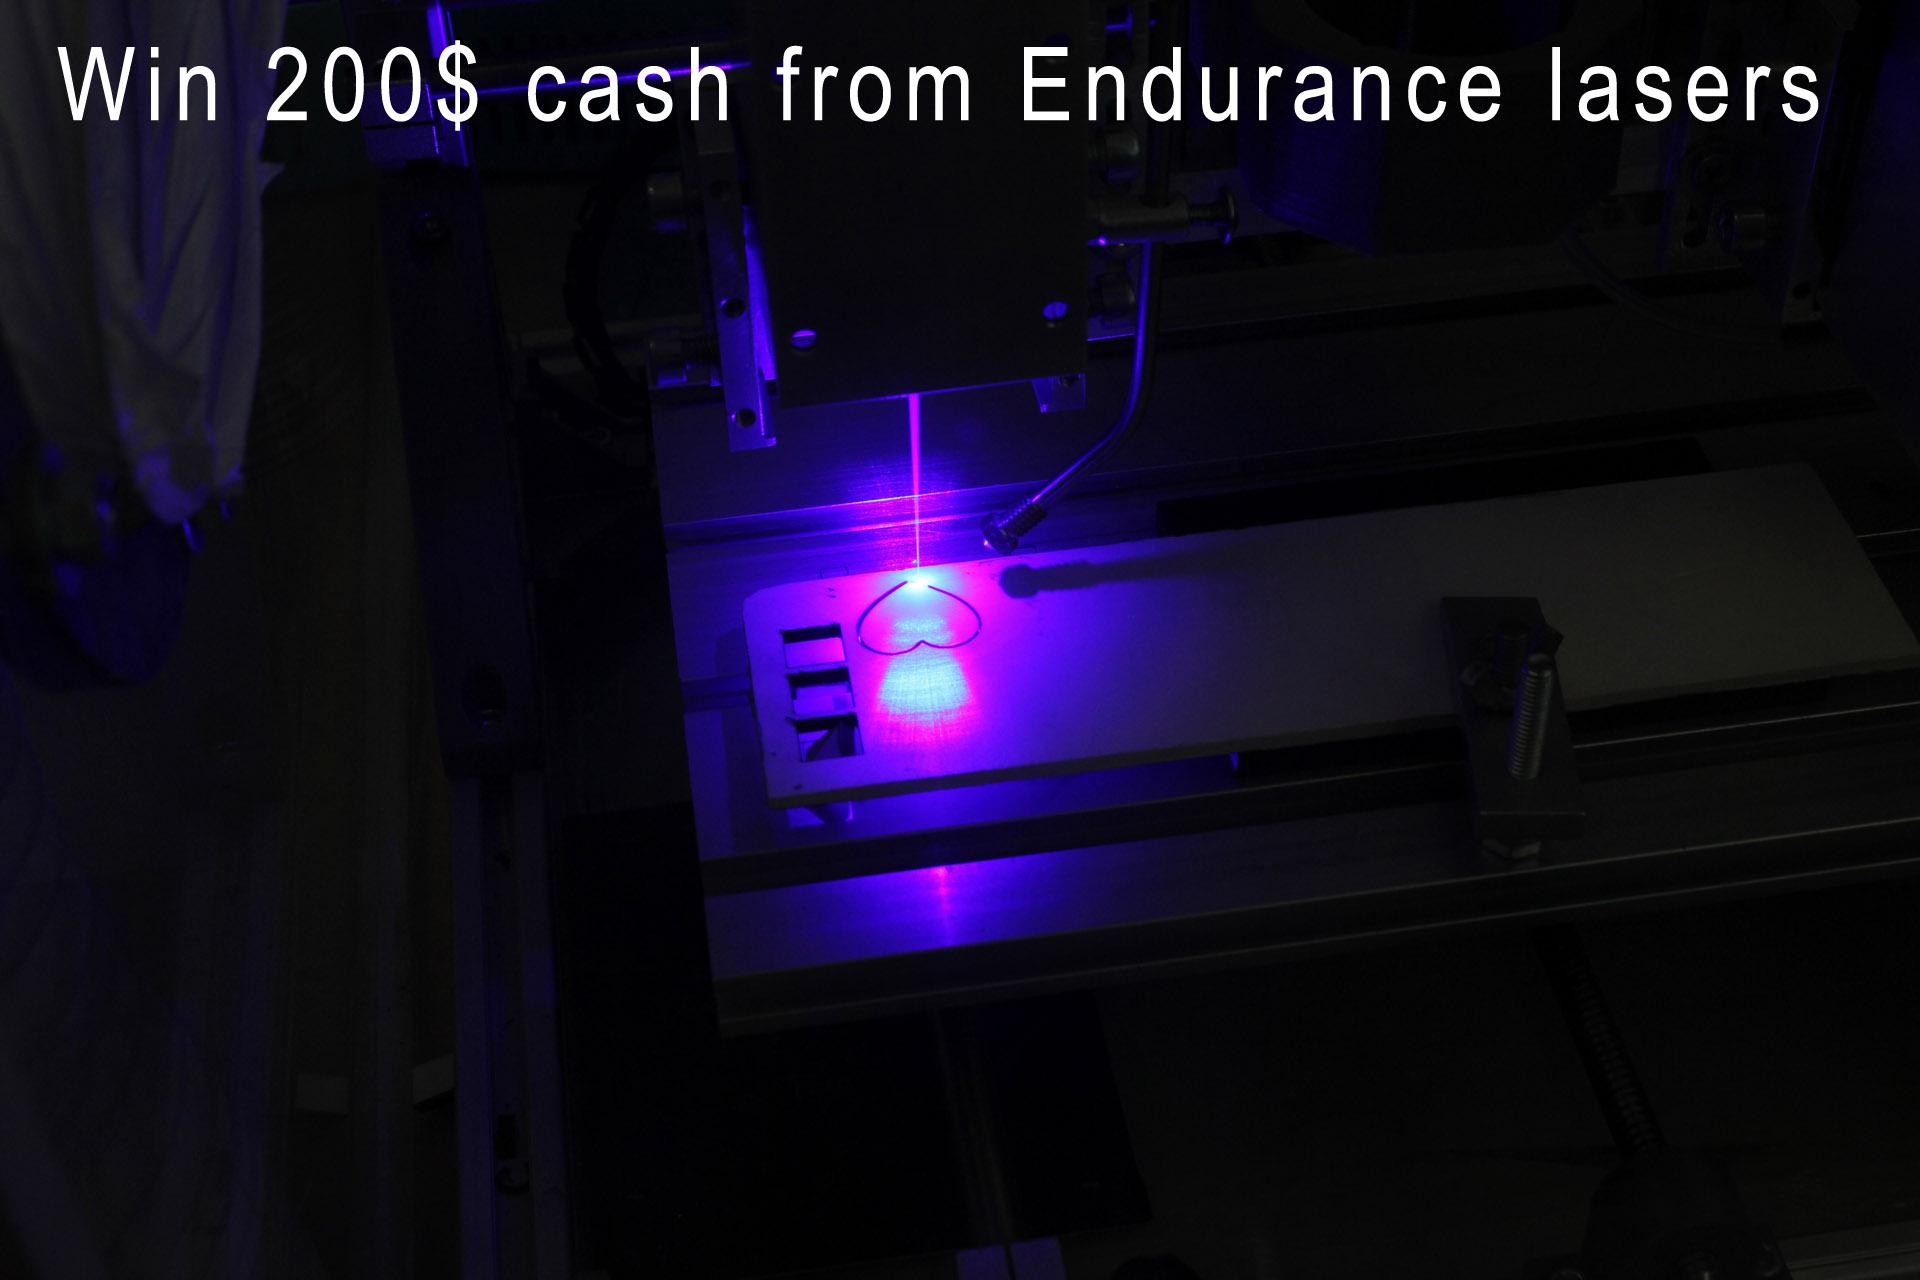 Endurance first 200$ cash giveaway.